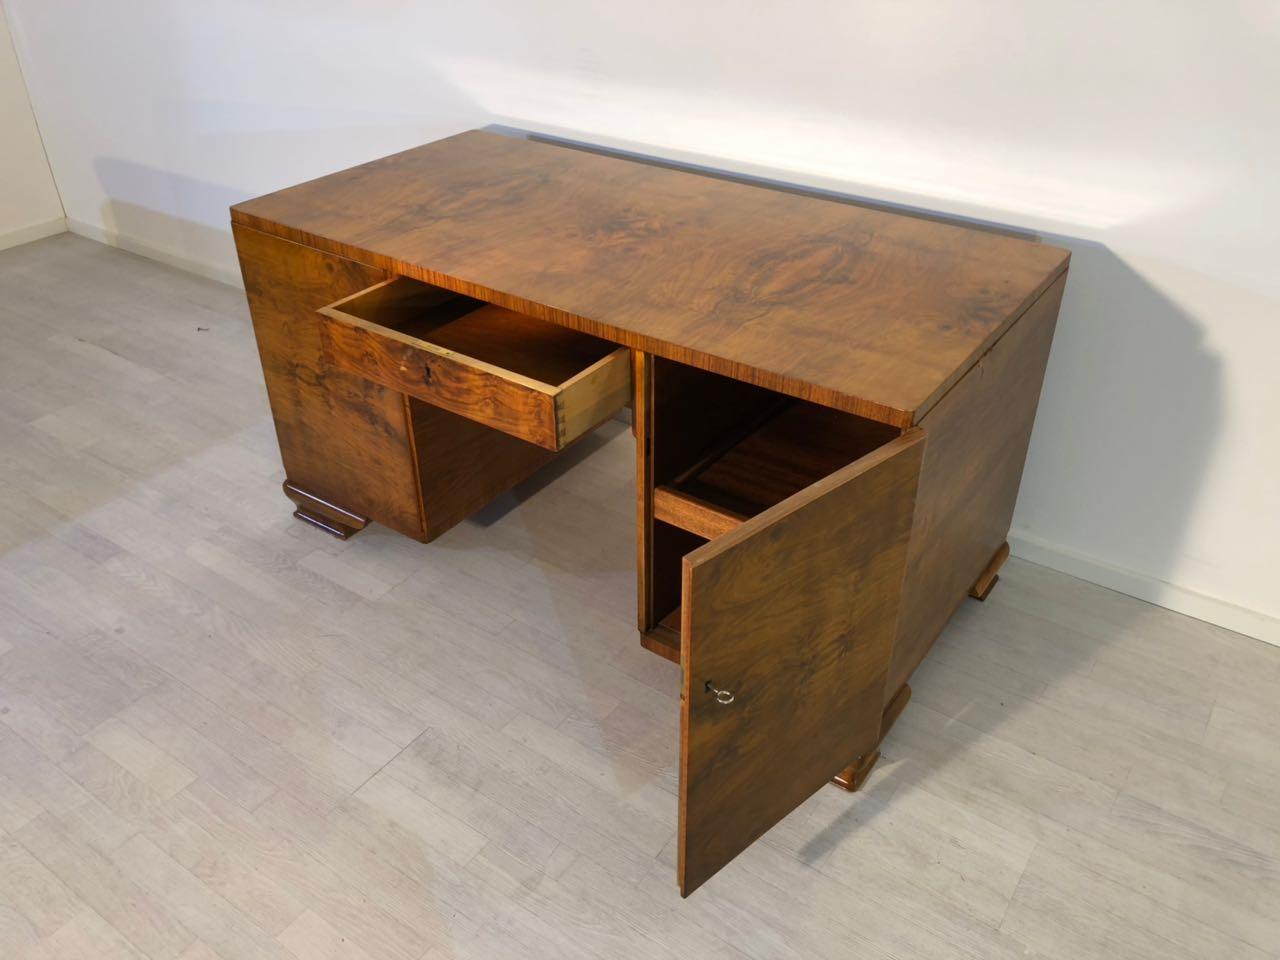 Art Deco Furniture Design Desk Burl Wood Walnut French